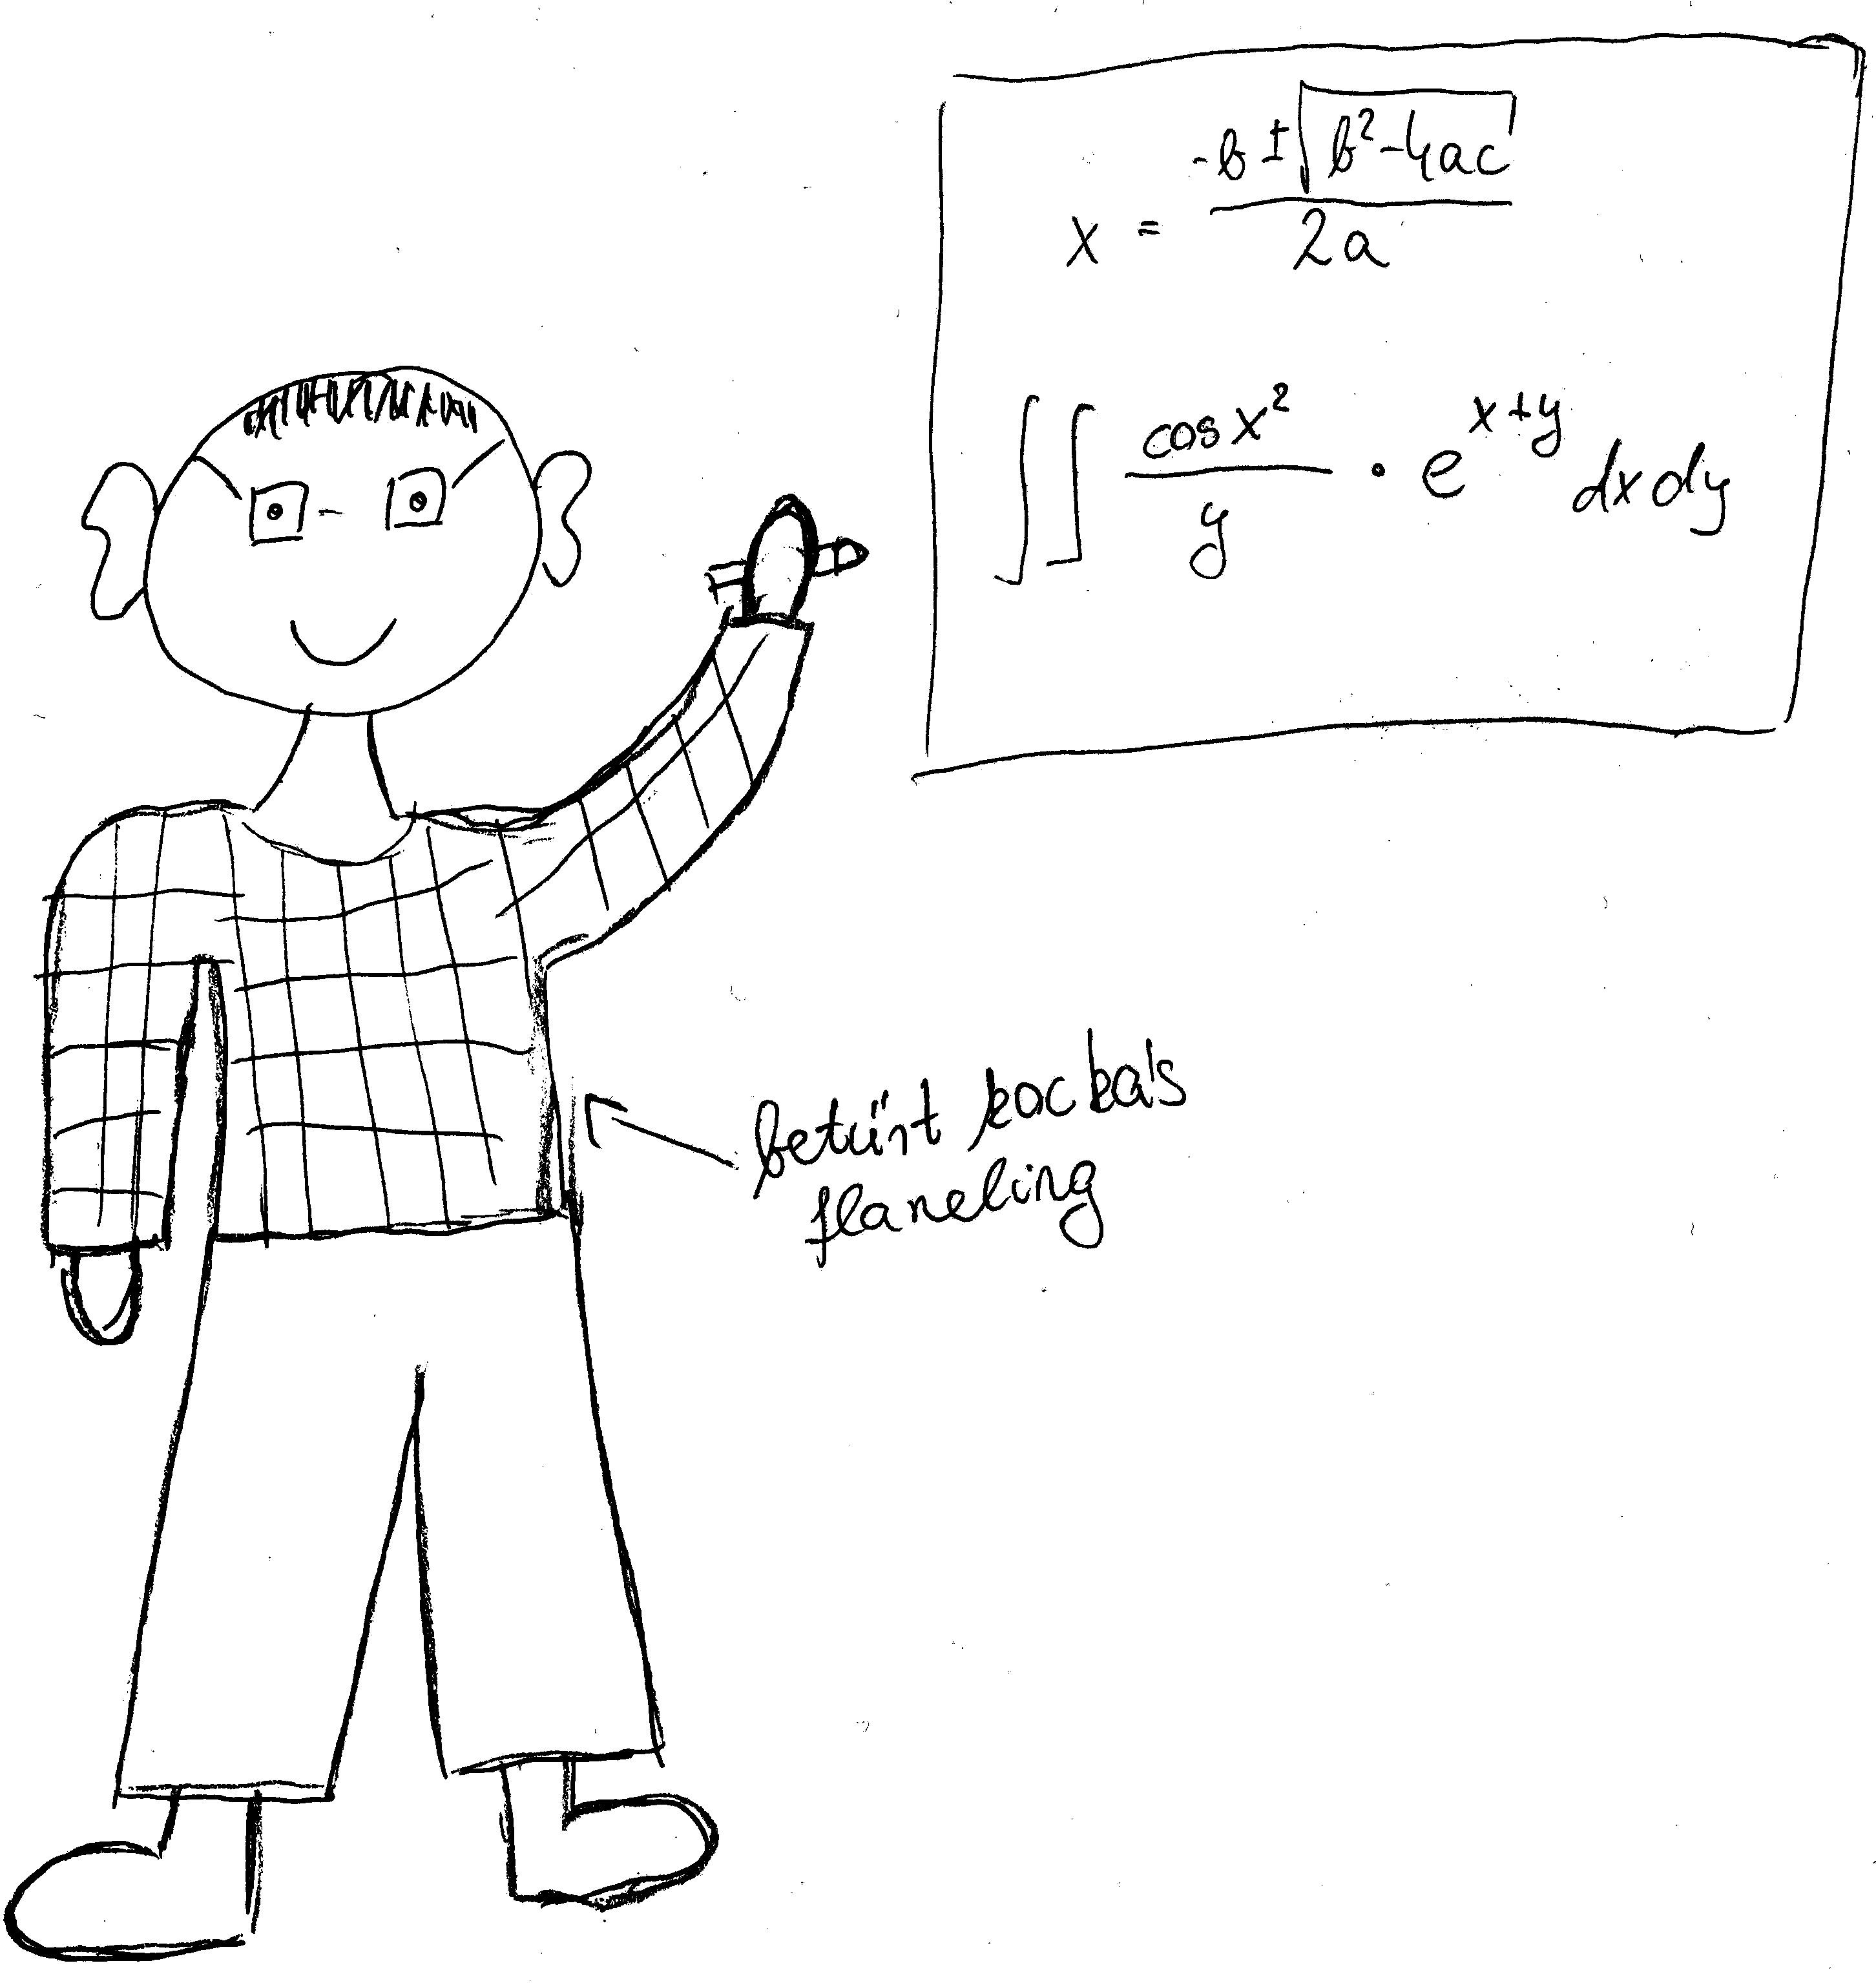 hallgato_matematikus_rajz.jpg